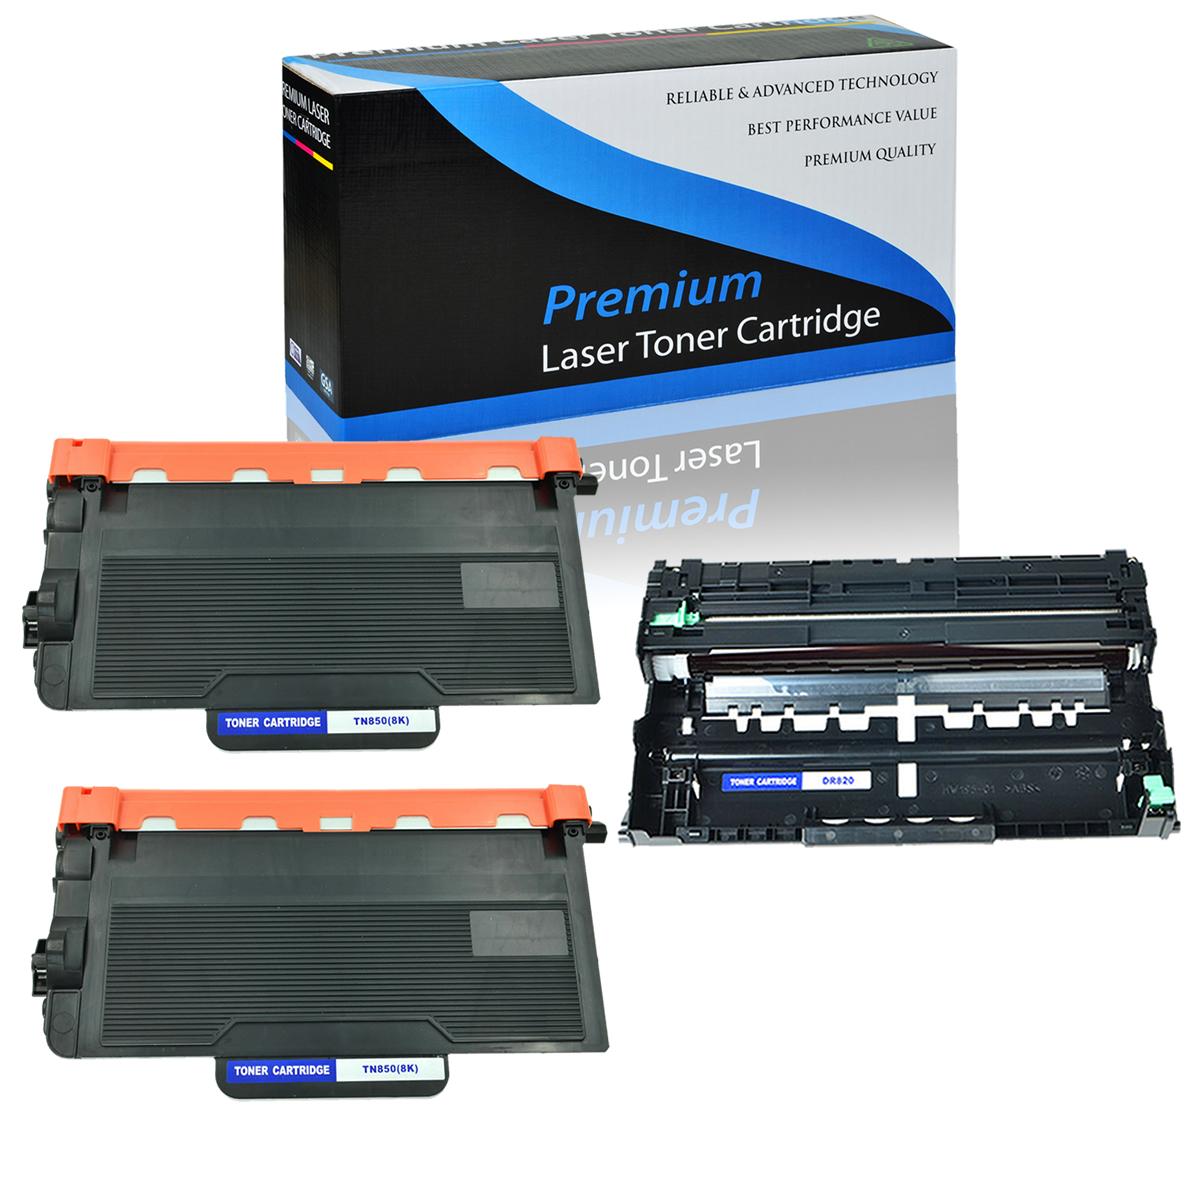 1 pk DR820 Drum for Brother DCP-L5650DN HL-L5000D Printer 3 pk TN850 Toner